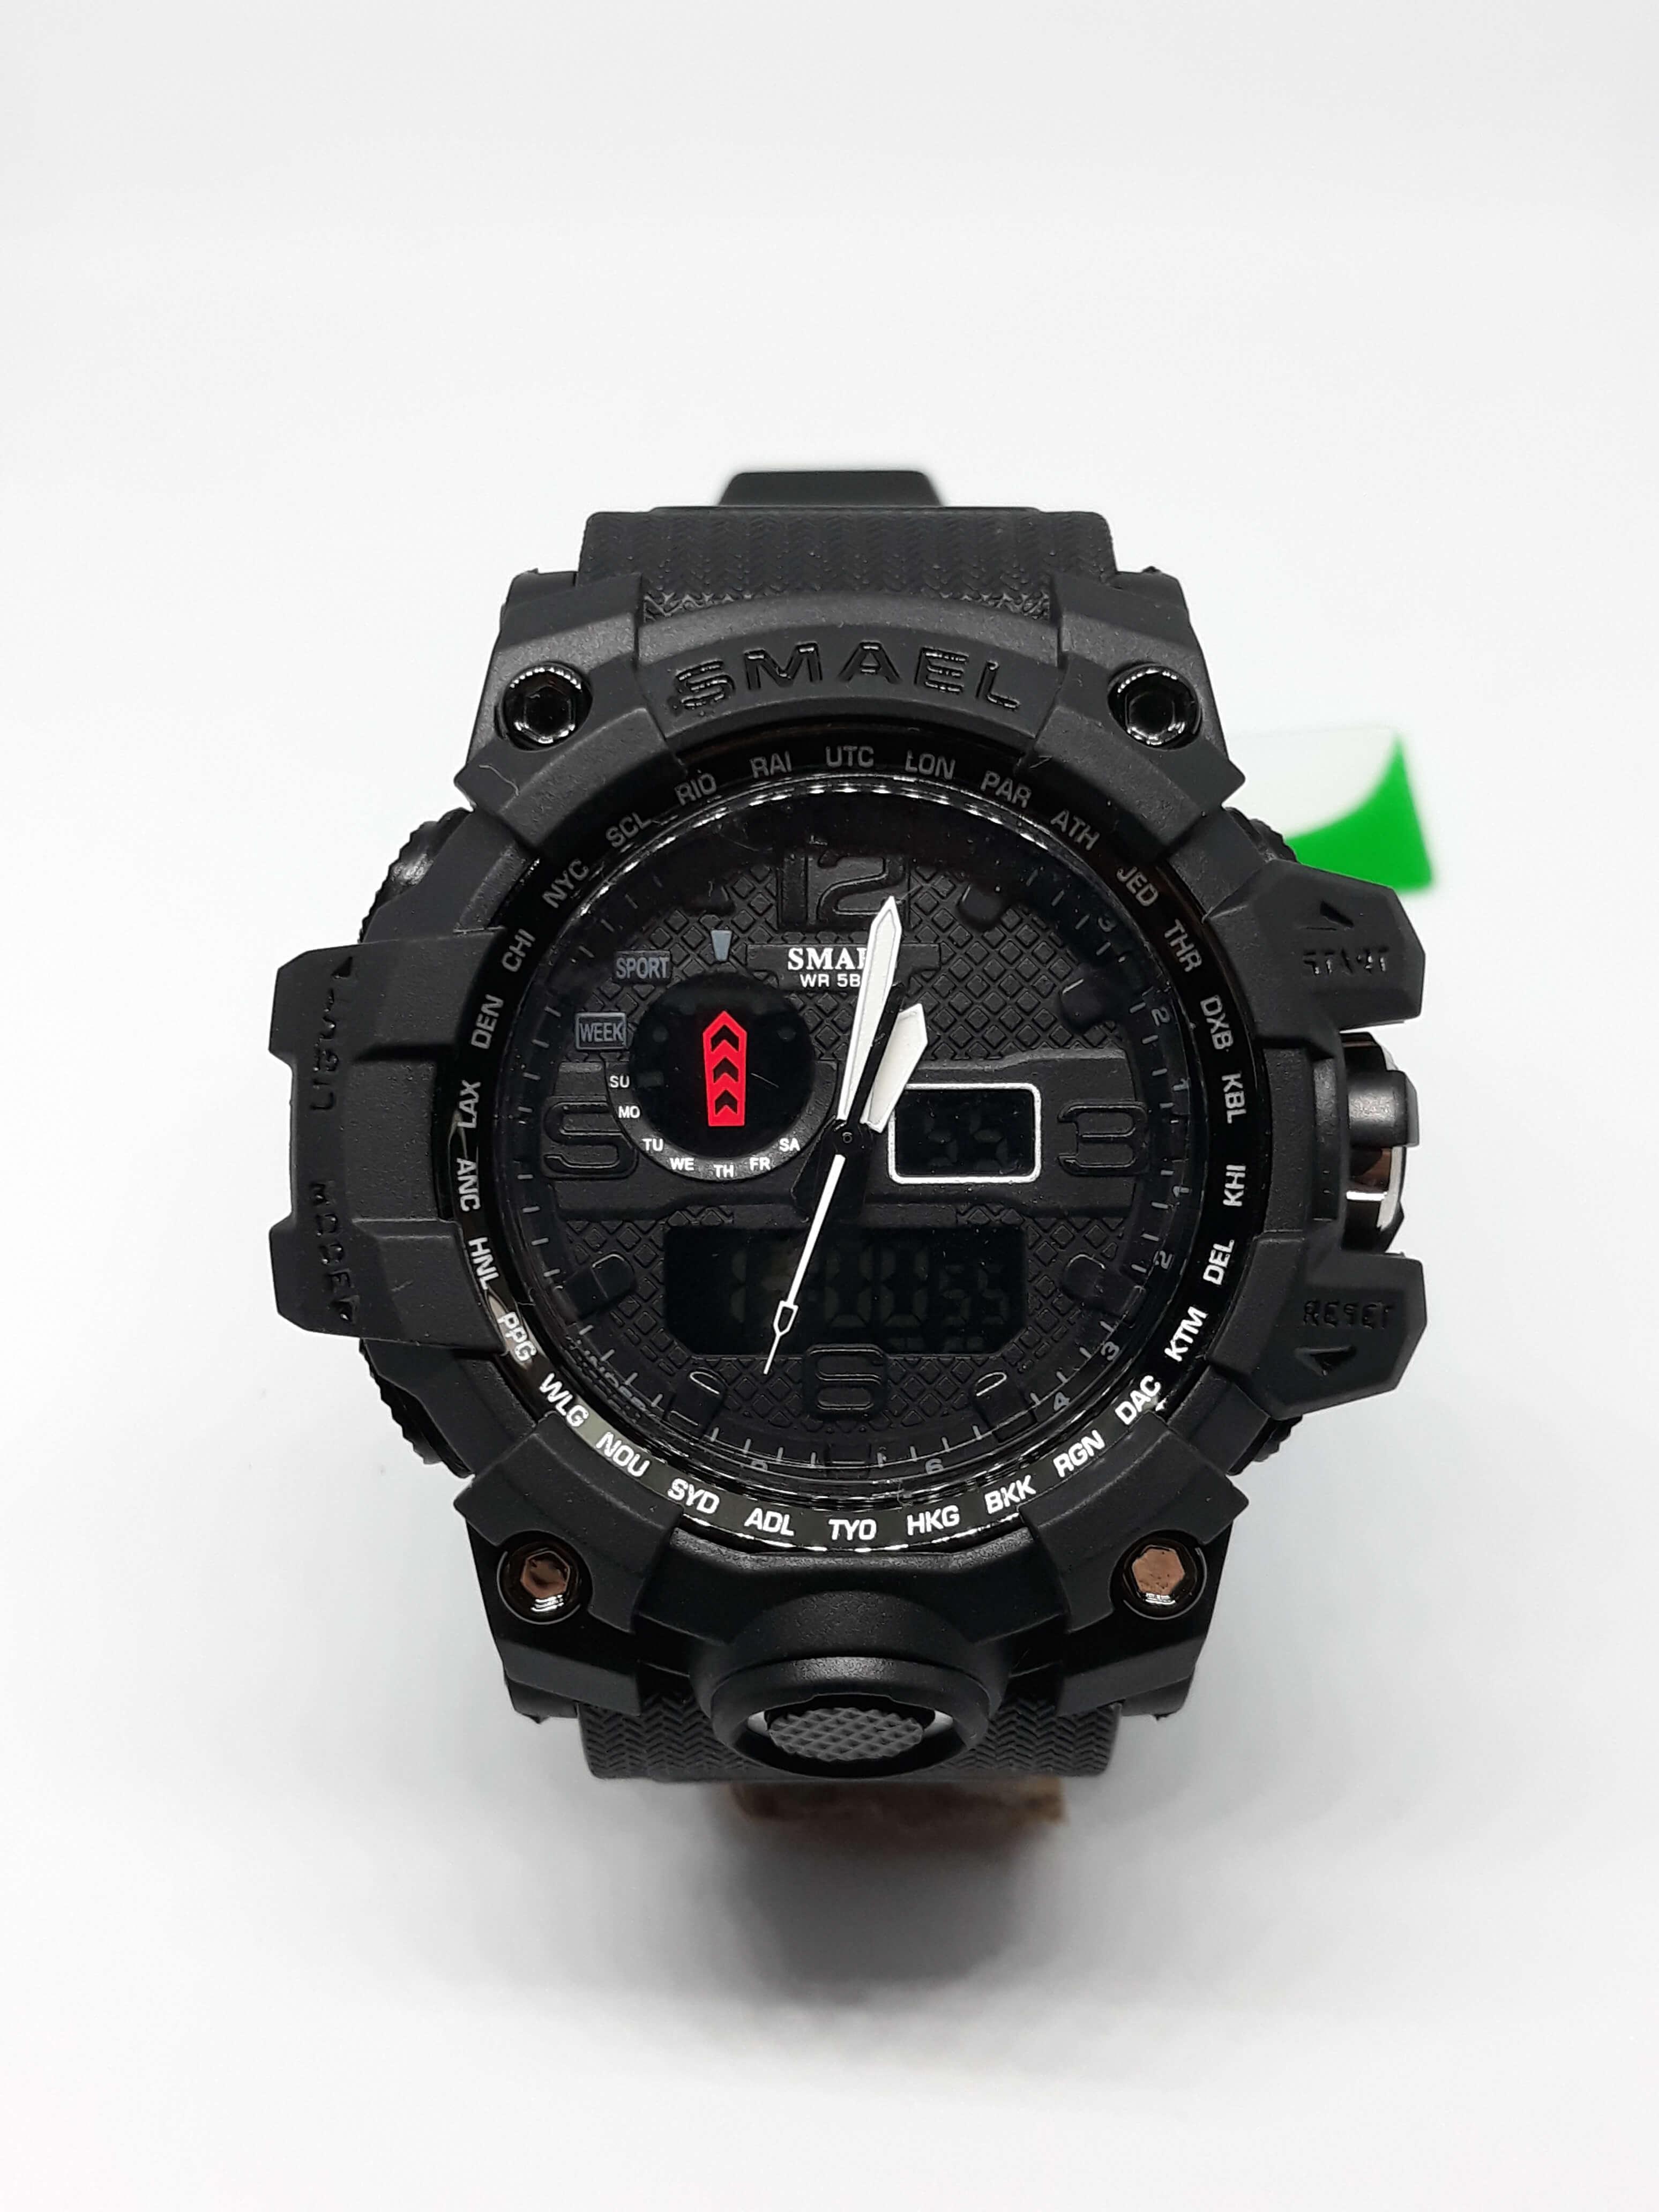 Zegarek Smael Camouflage czarny 16